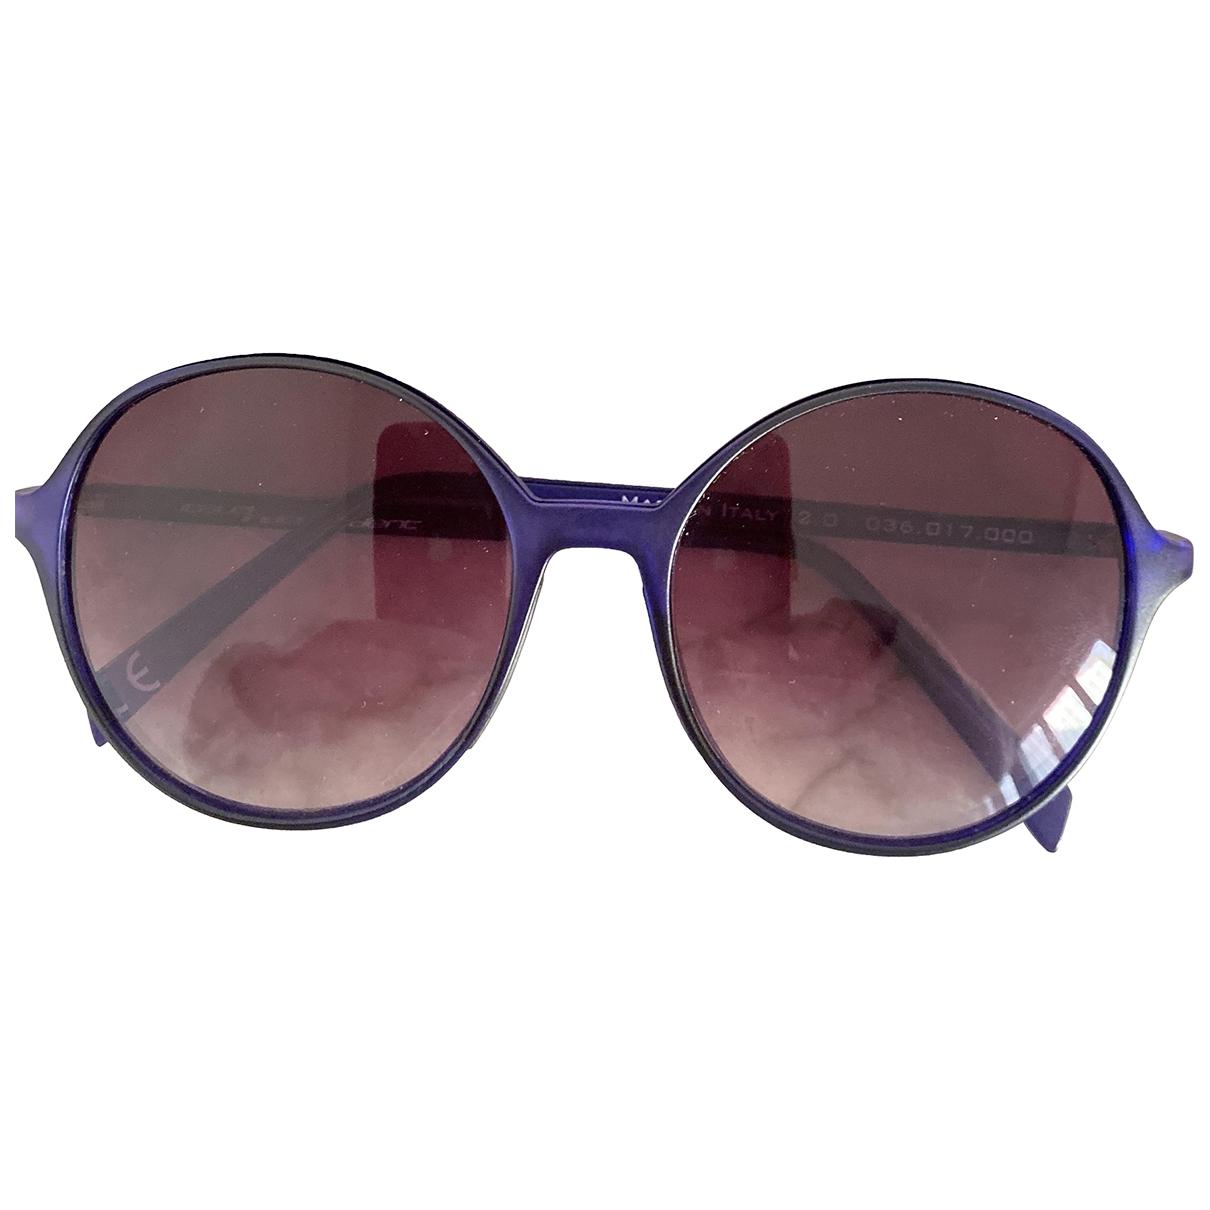 Gafas oversize Italia Independent